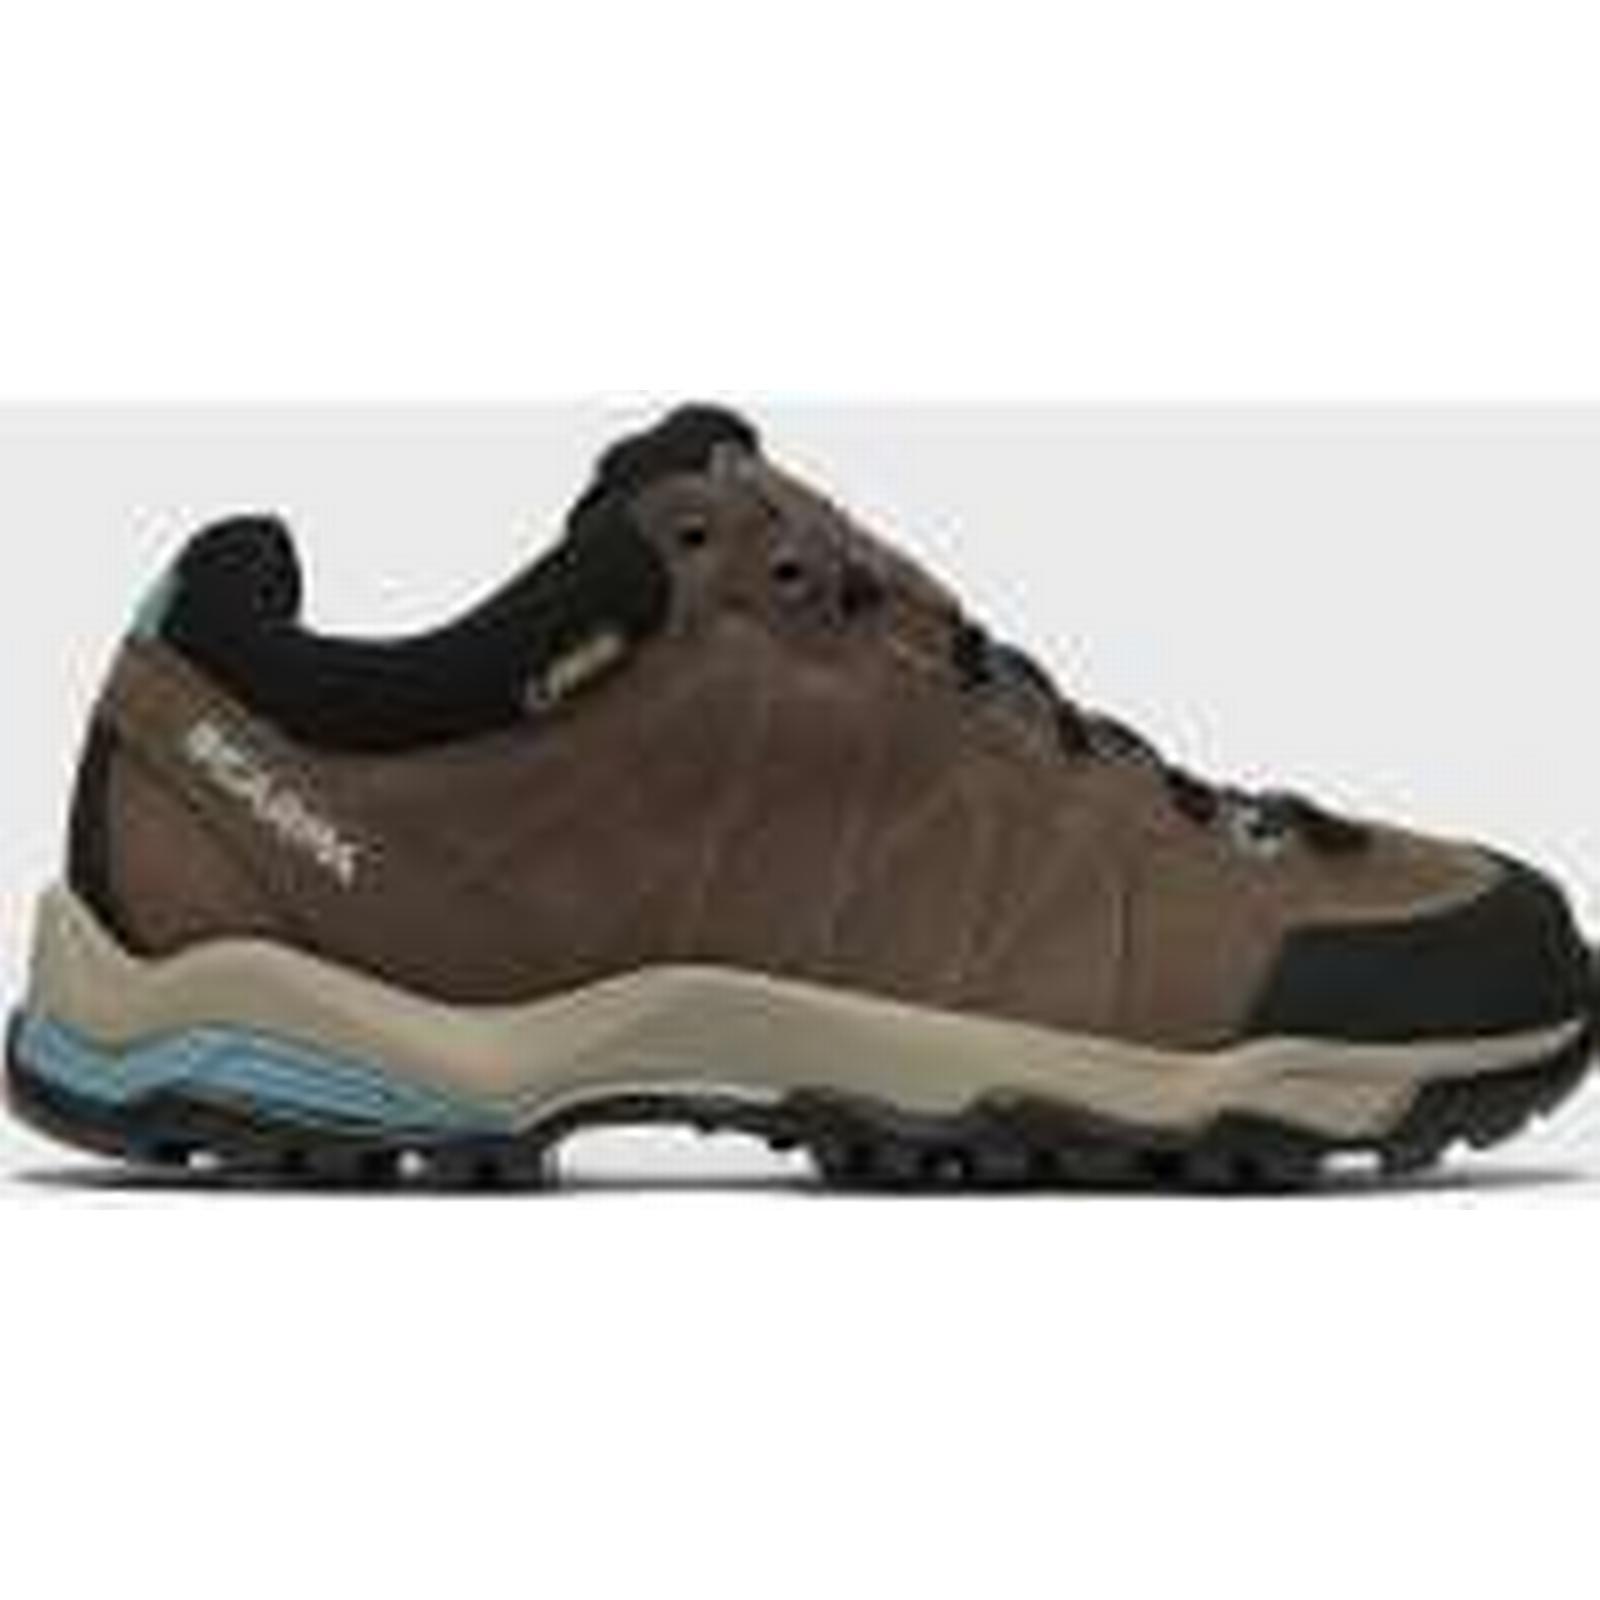 Scarpa Women's Shoe Moraine Plus GTX Approach Shoe Women's - Brown, Brown d7352d